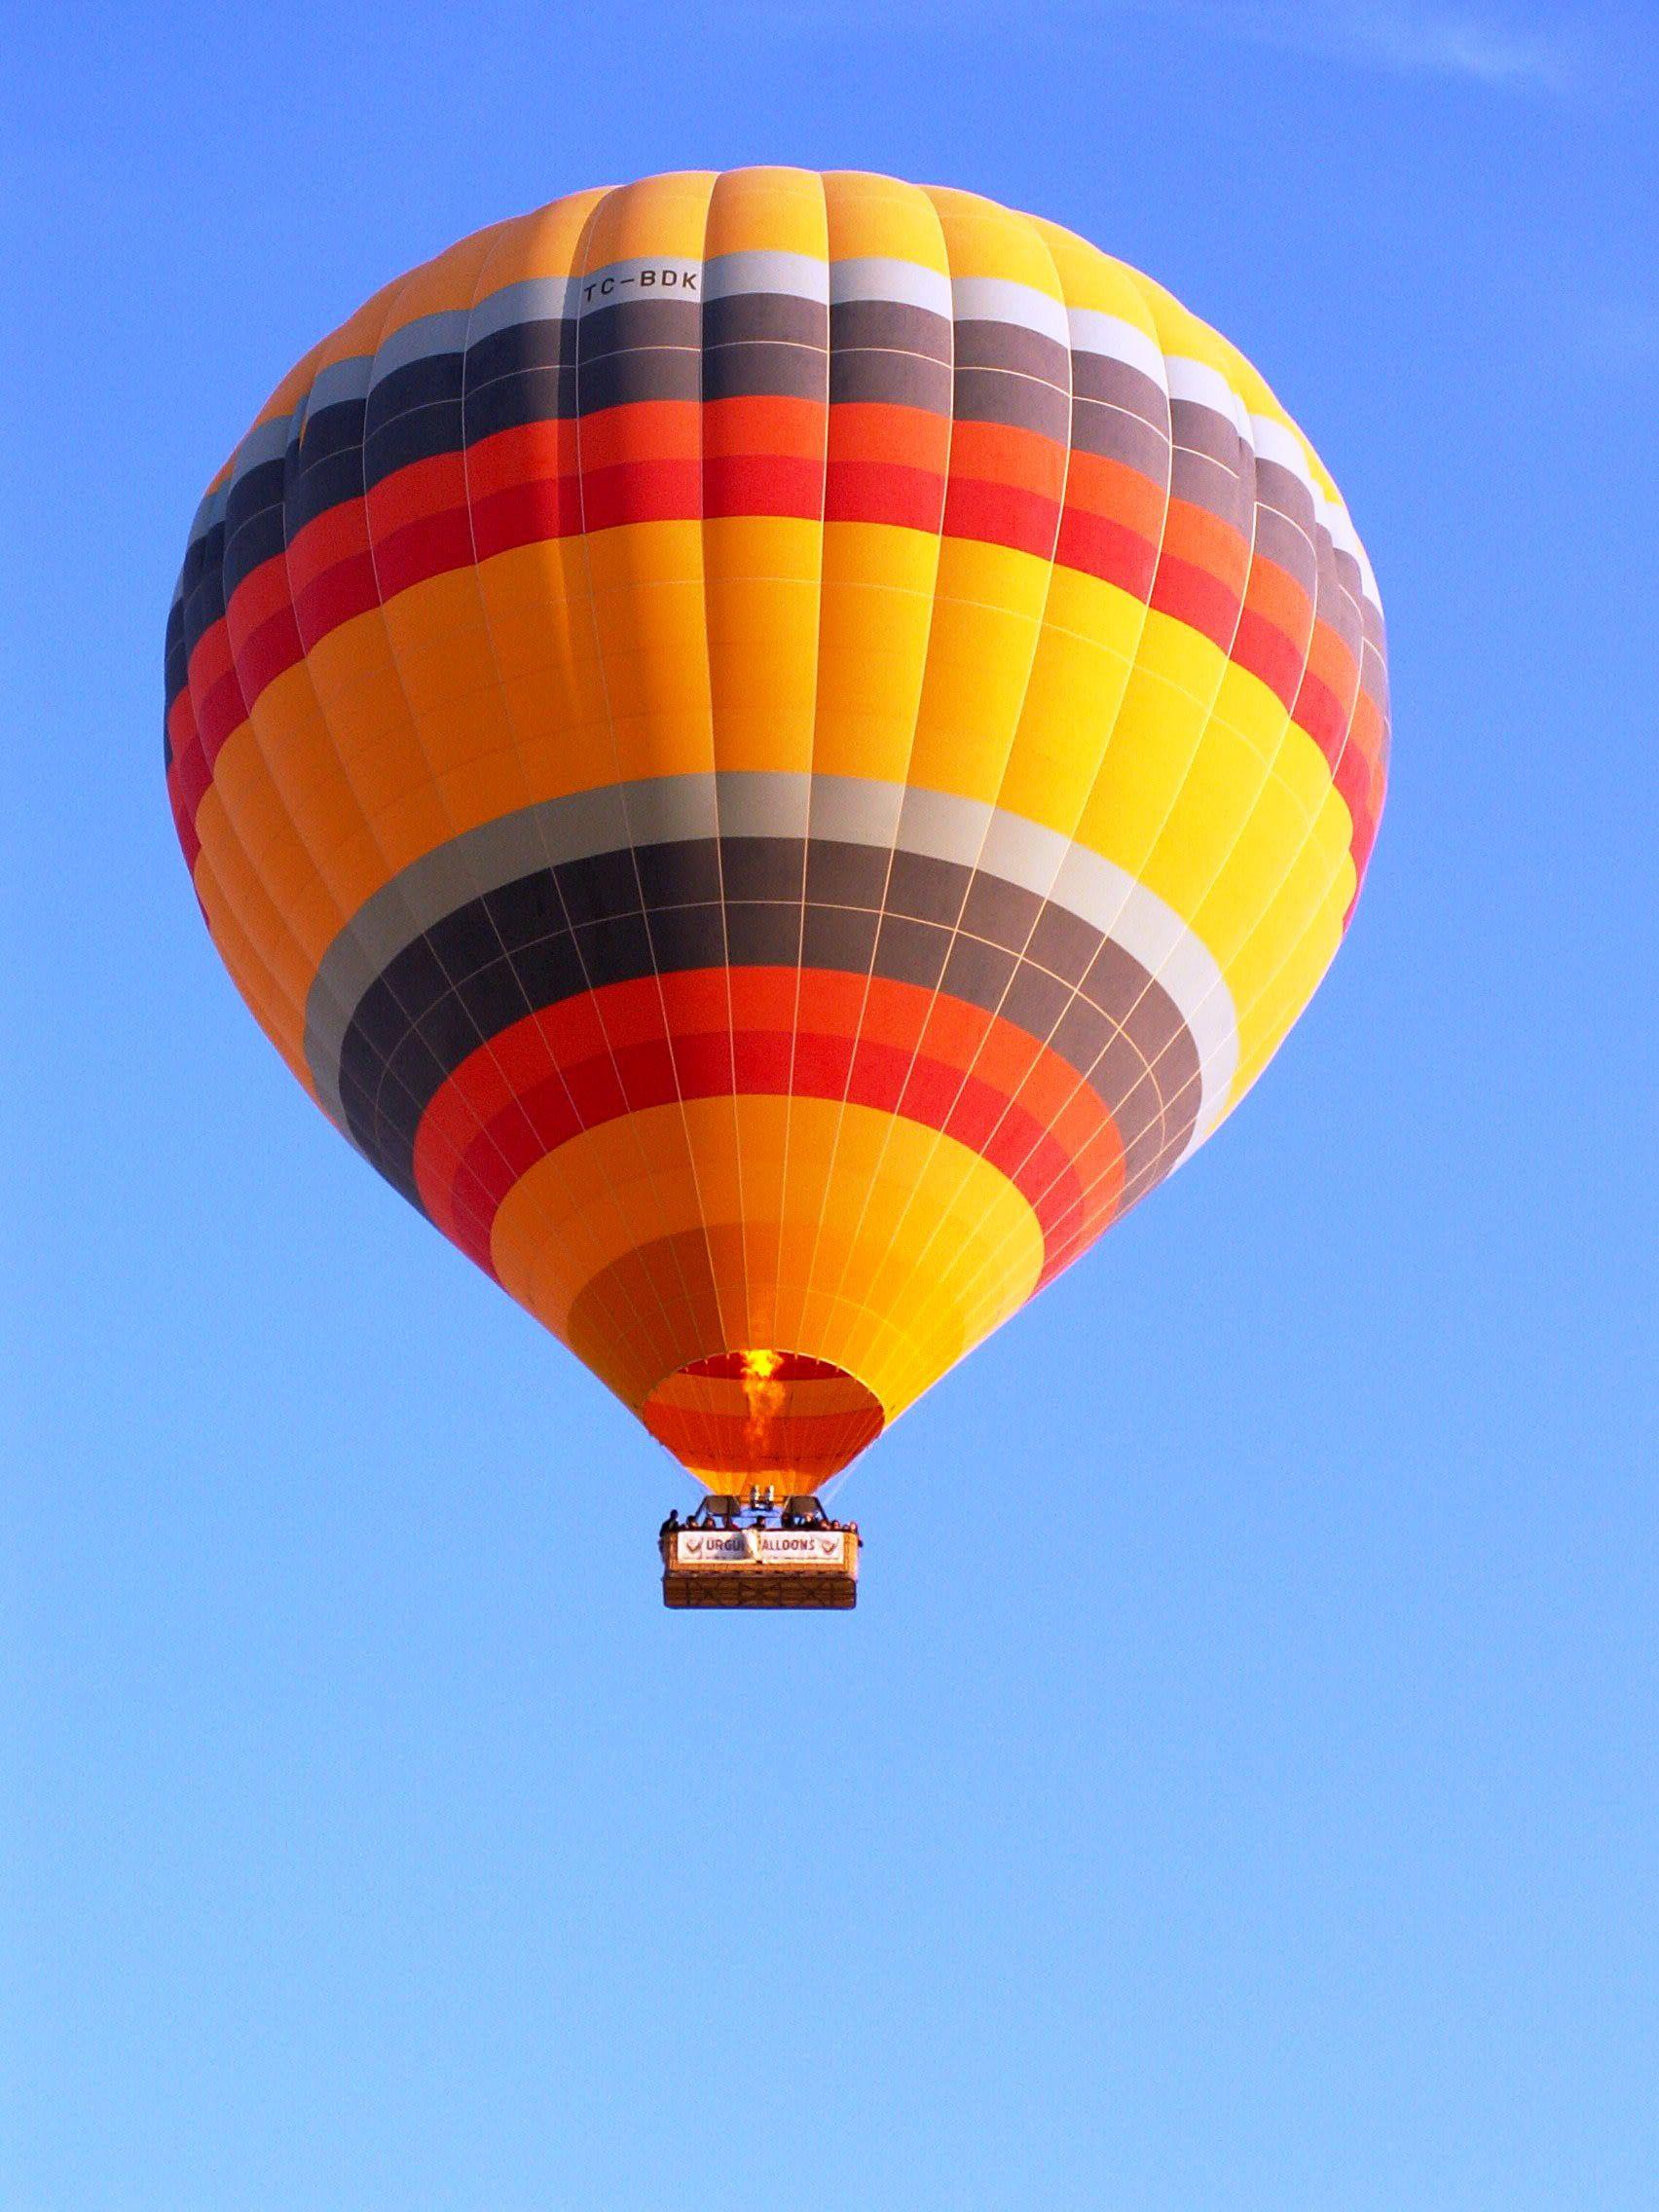 Orange Black And Yellow Hotair Balloon Flying On Sky Cappadocia Cappadocia Walk In In The Skies Cappadocia Xliv Orange B Balloons Wallpaper Hd Wallpaper